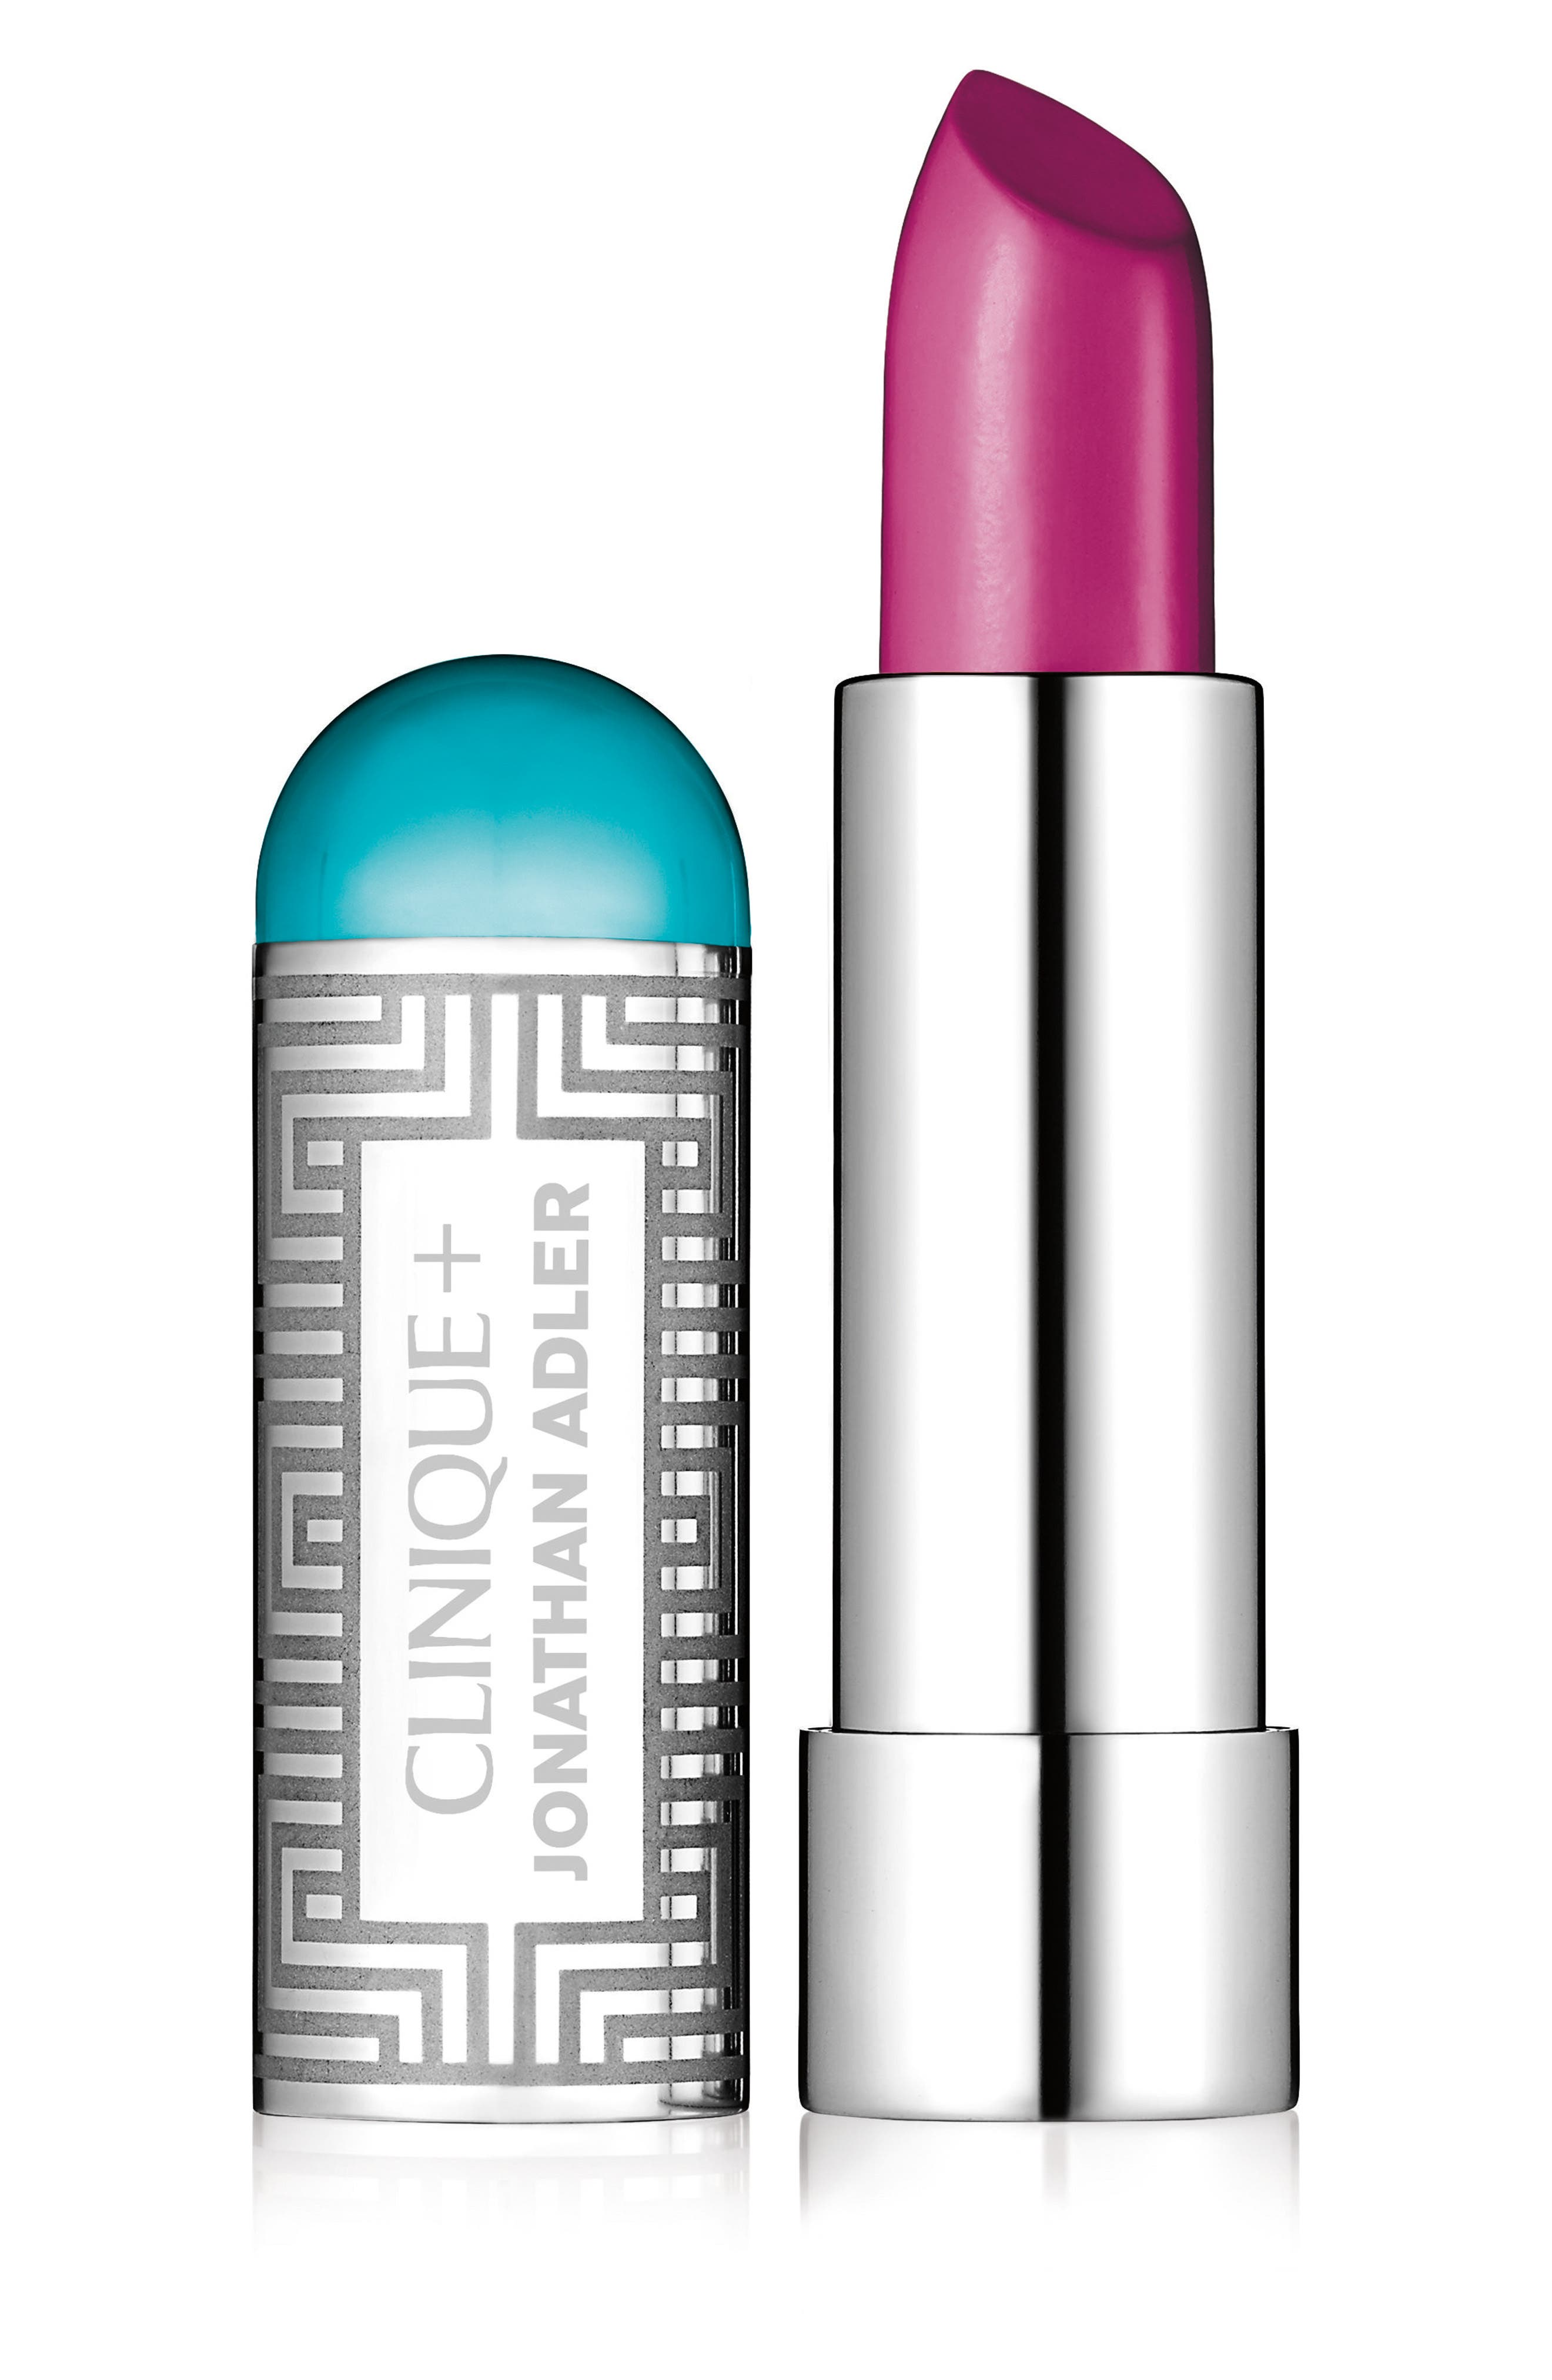 Alternate Image 1 Selected - Clinique Jonathan Adler Pop Lip Color + Primer (Limited Edition)